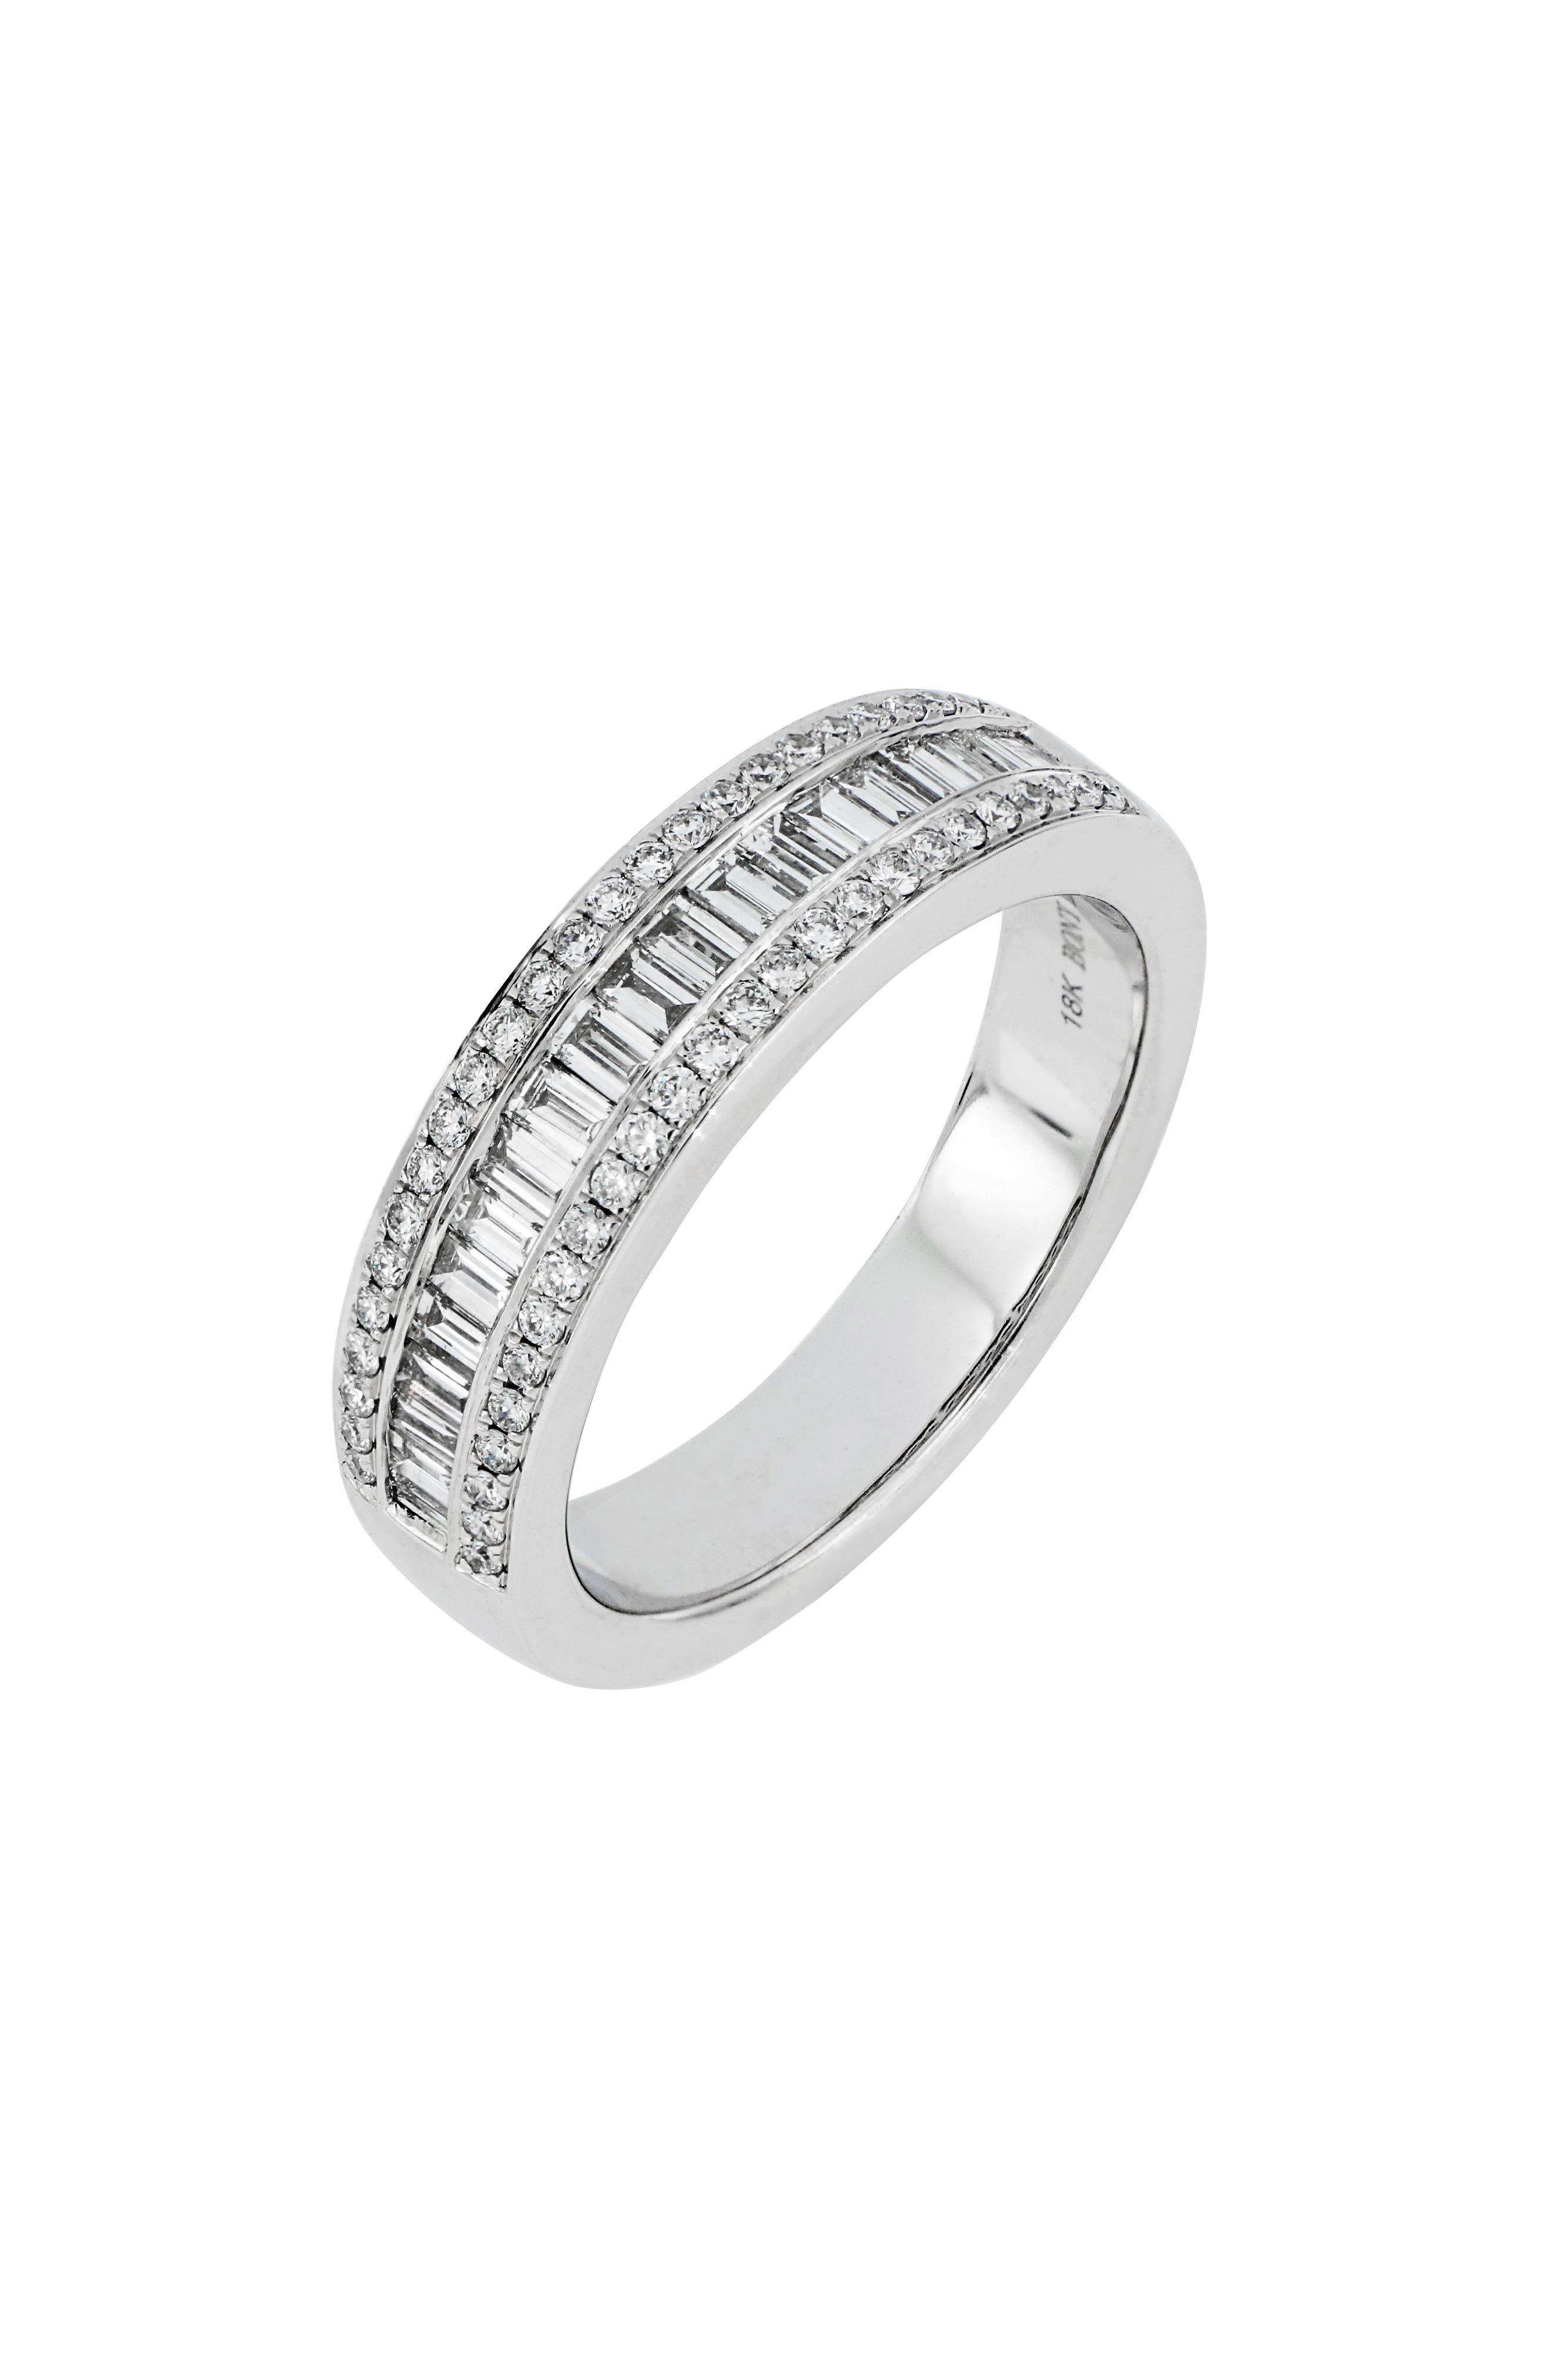 Baguette Diamond Ring,                         Main,                         color, WHITE GOLD/ DIA